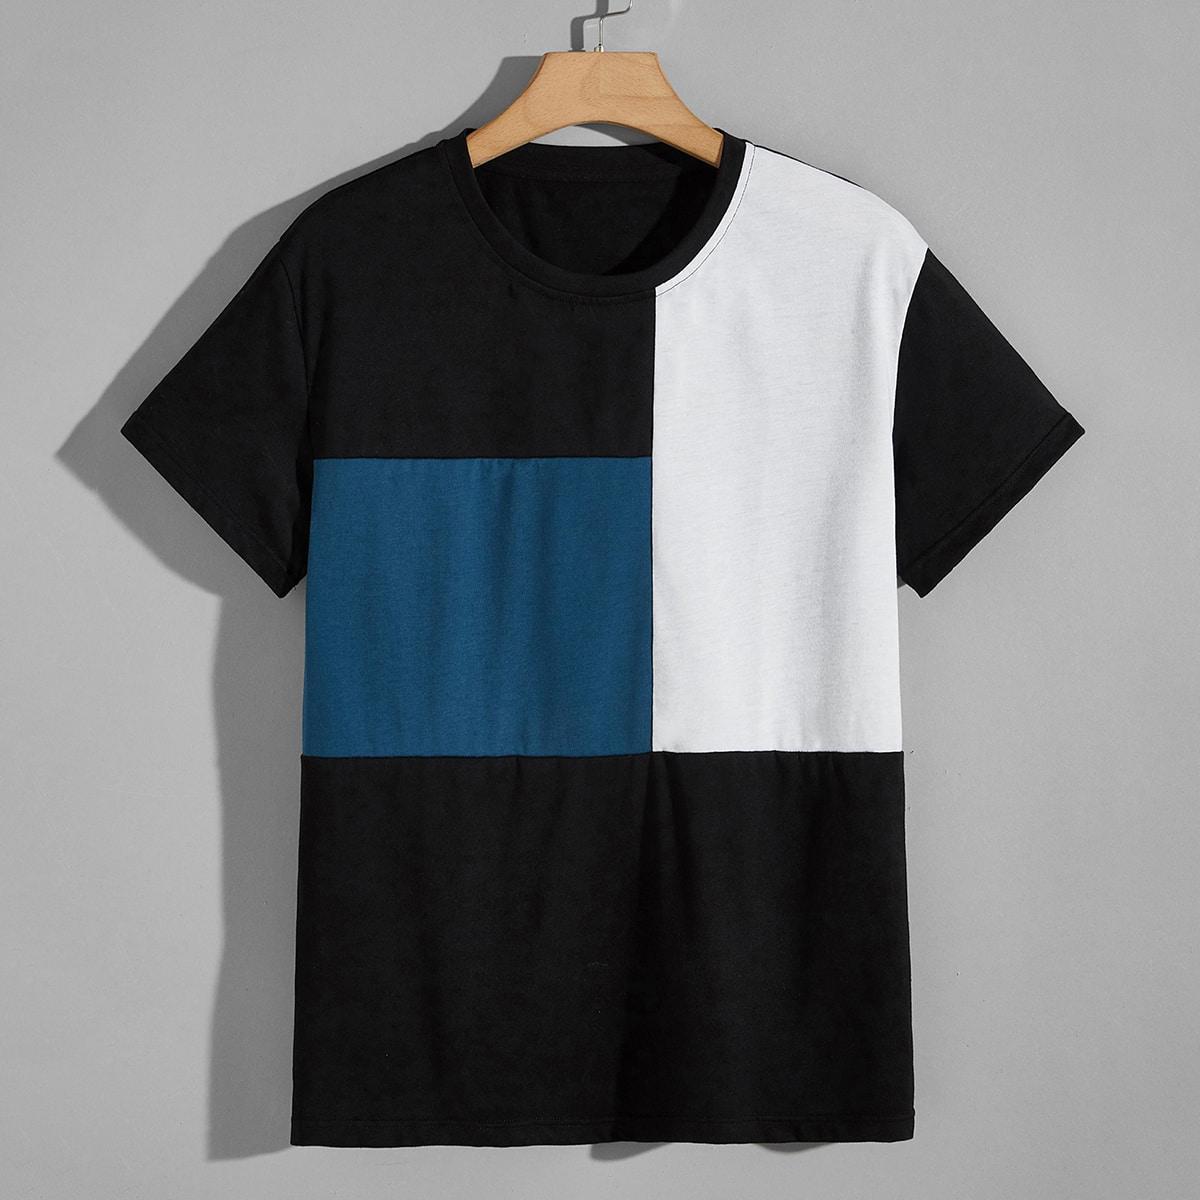 Мужская контрастная футболка с короткимирукавами по цене 780